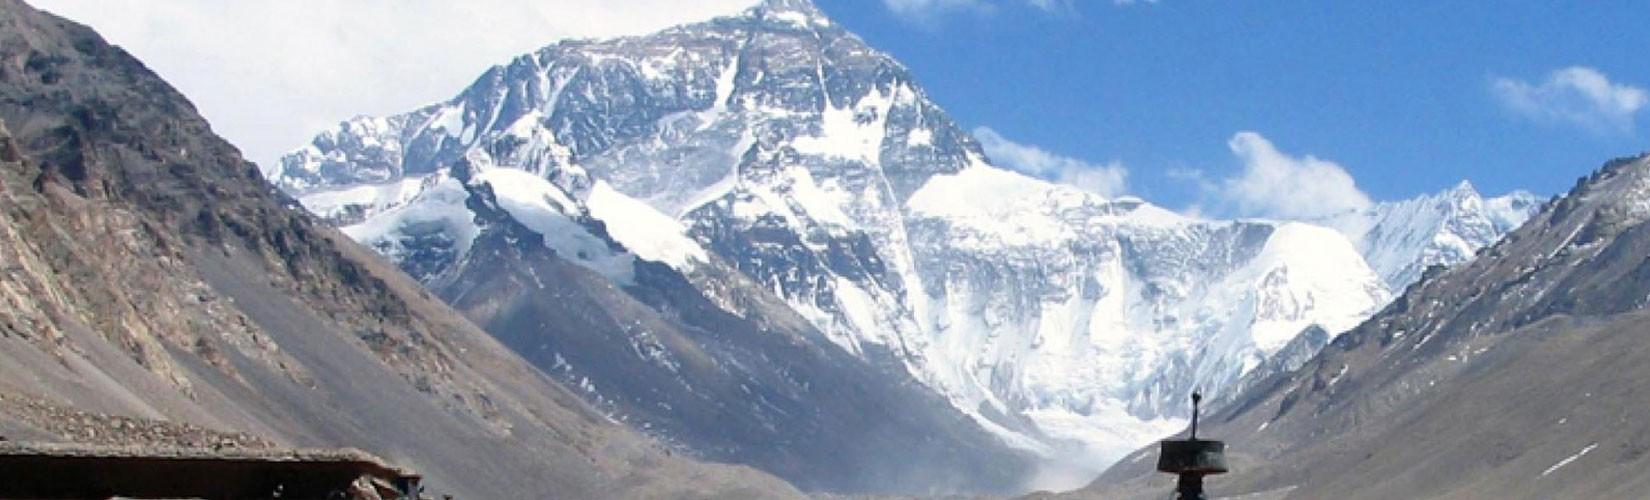 Everest Base Camp Tour via Lhasa